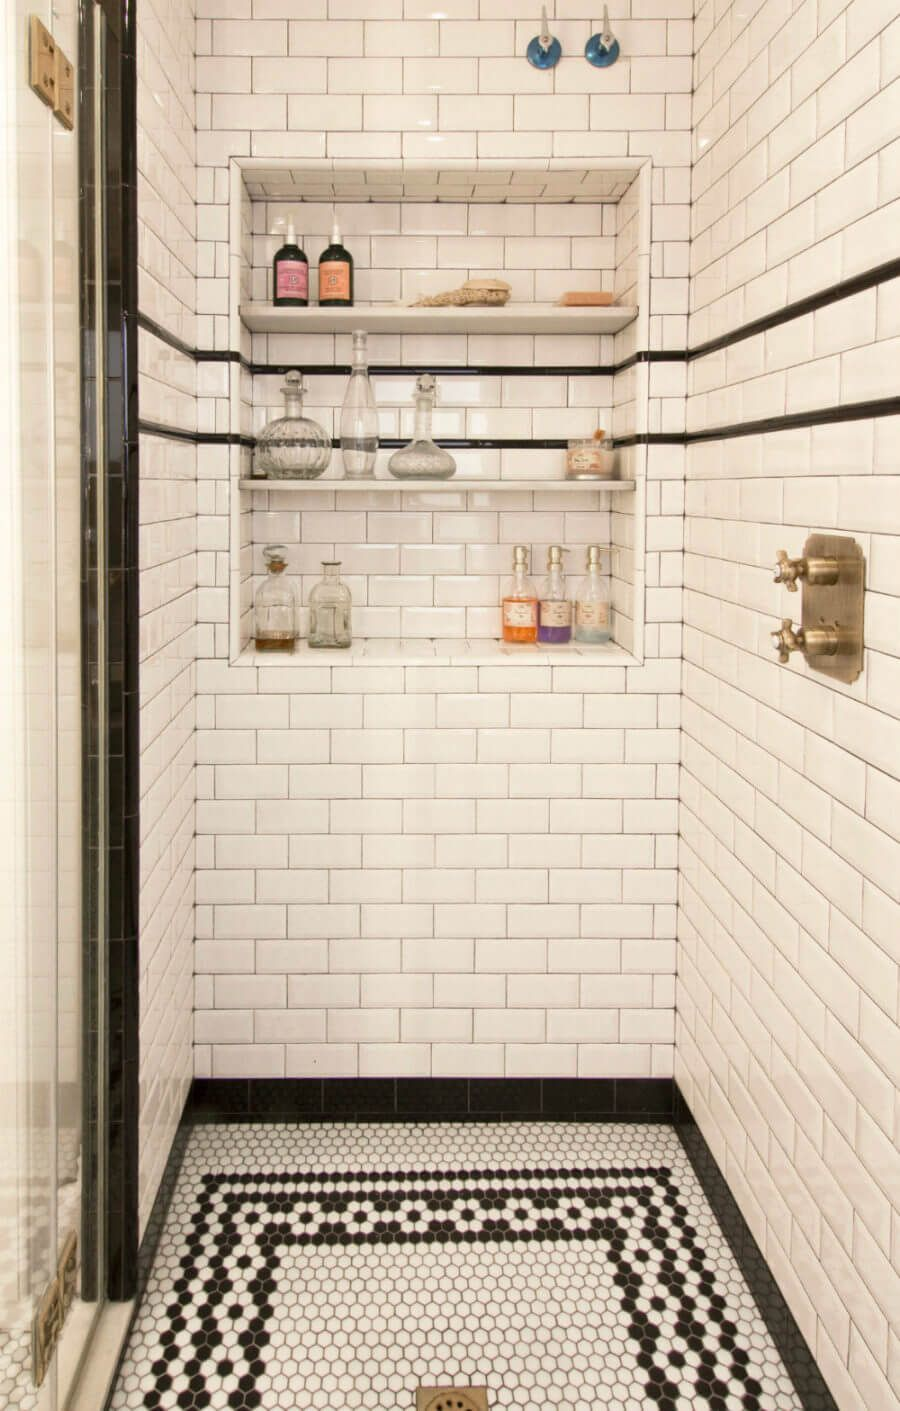 Bathroom classic tile ideas photo